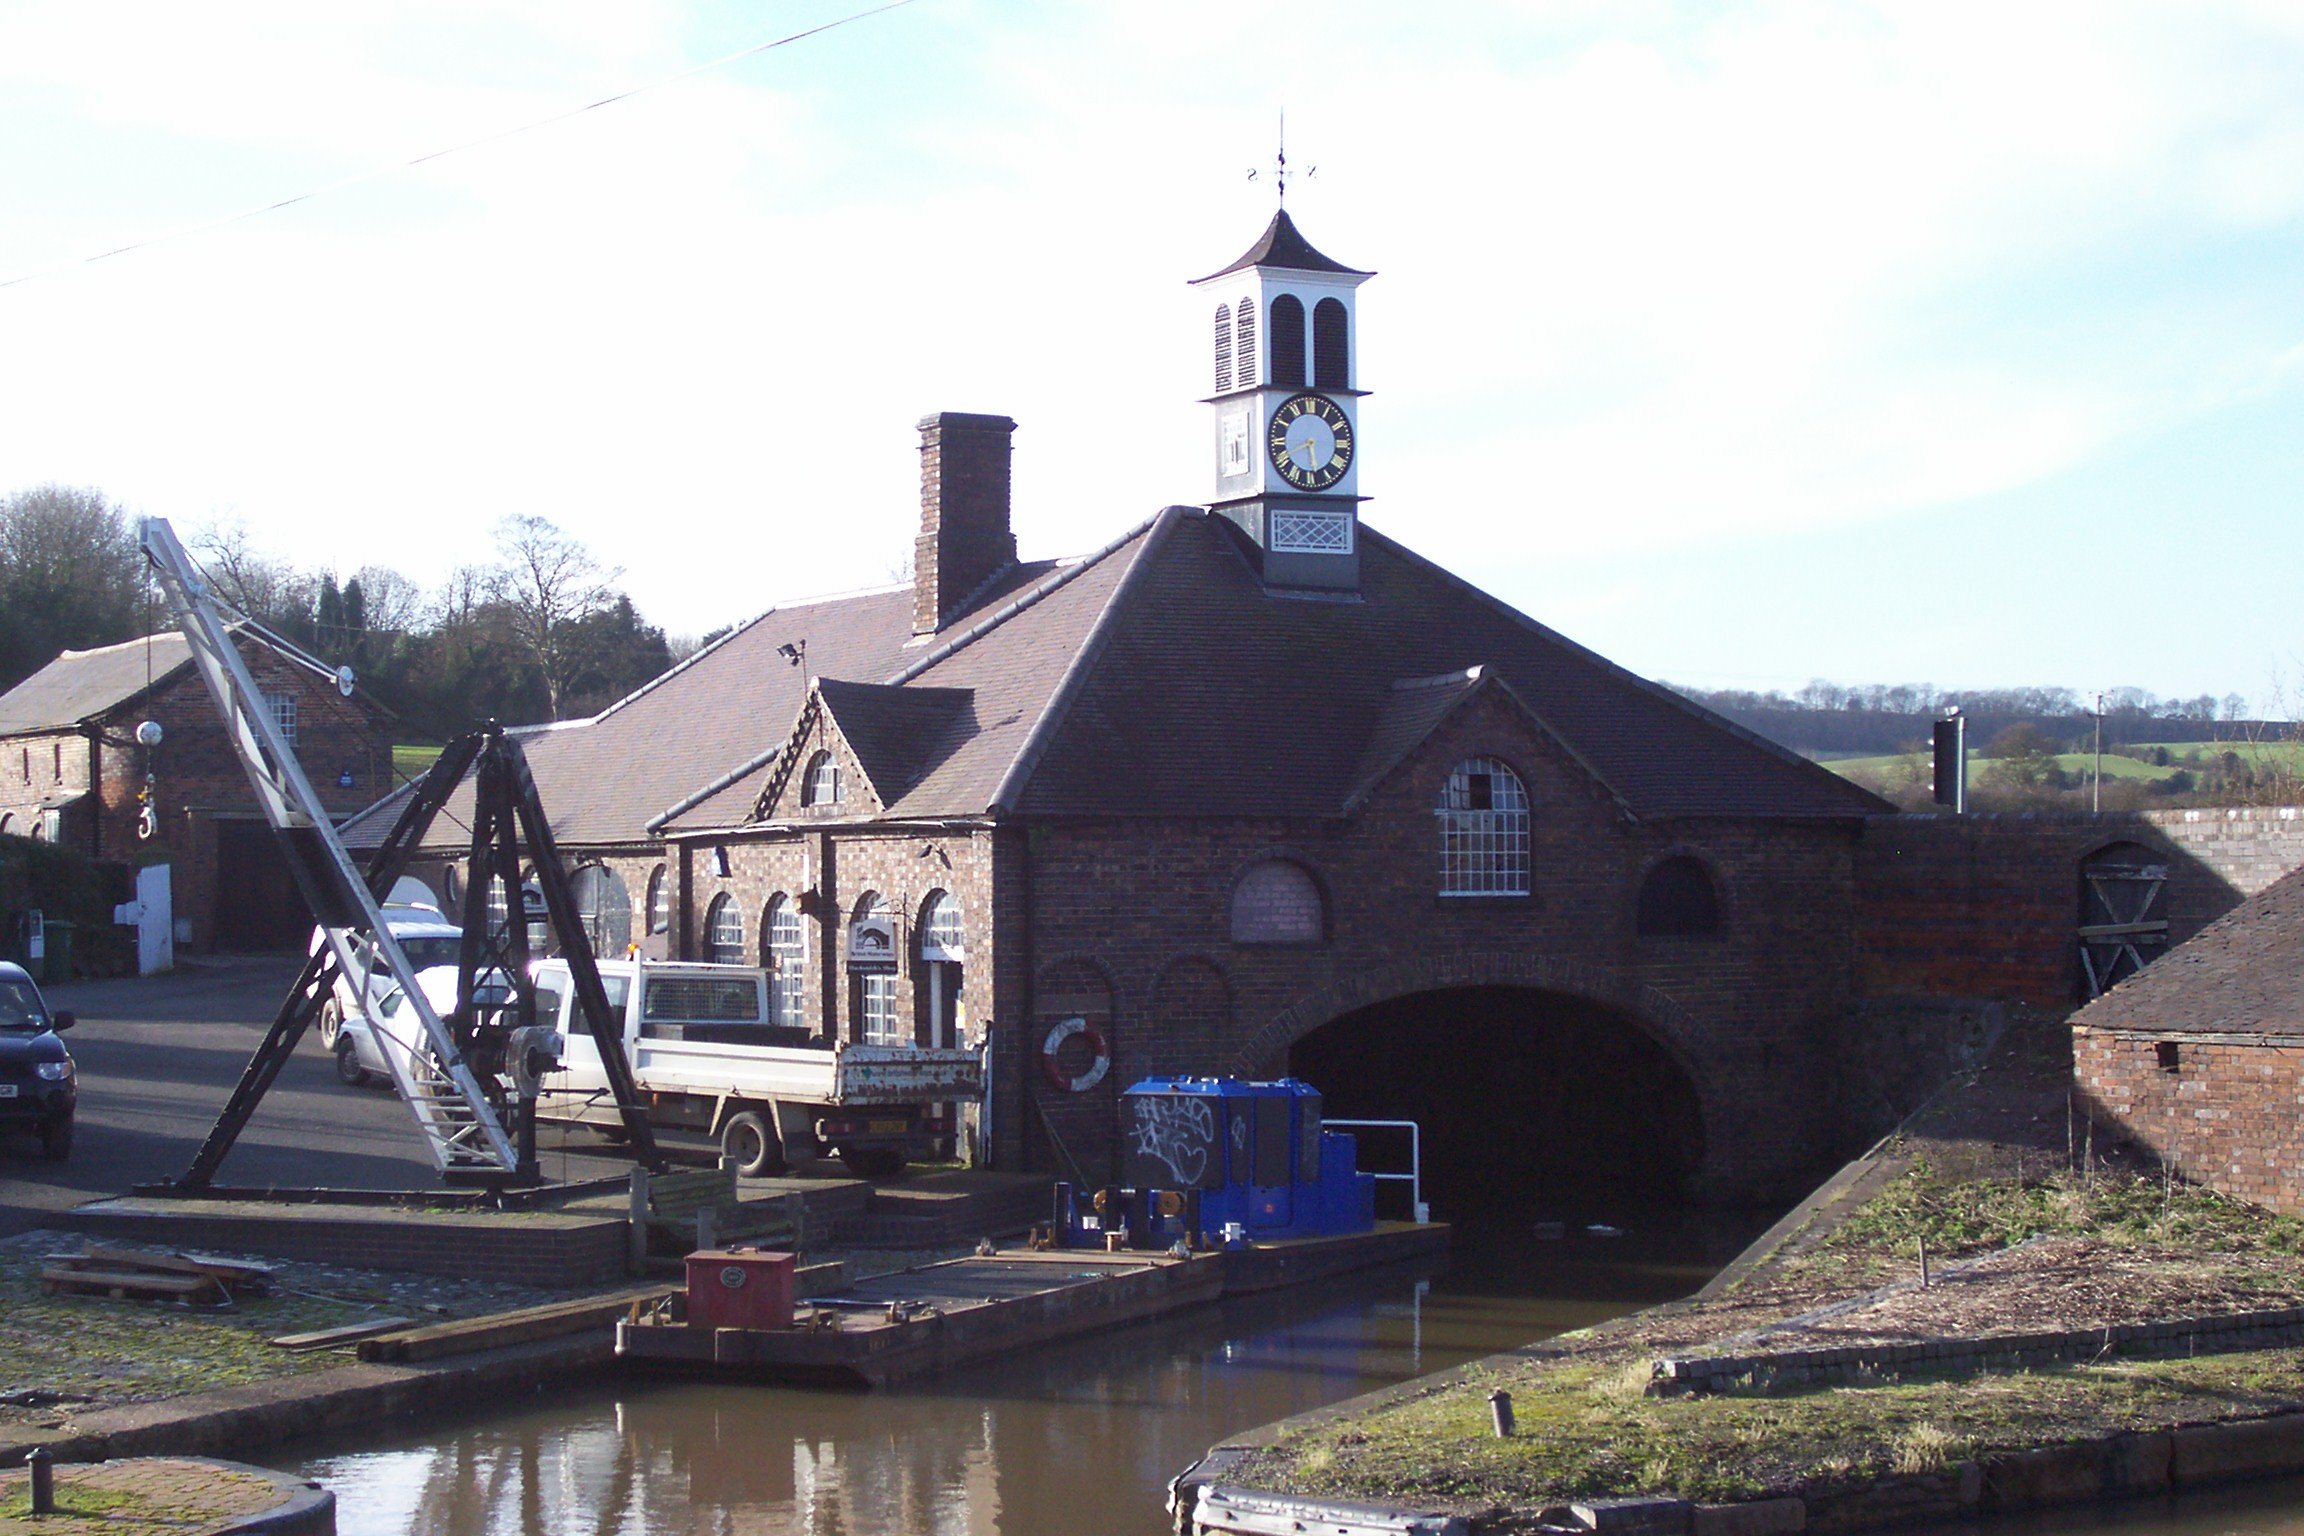 Hartshill Maintenance Boatyard